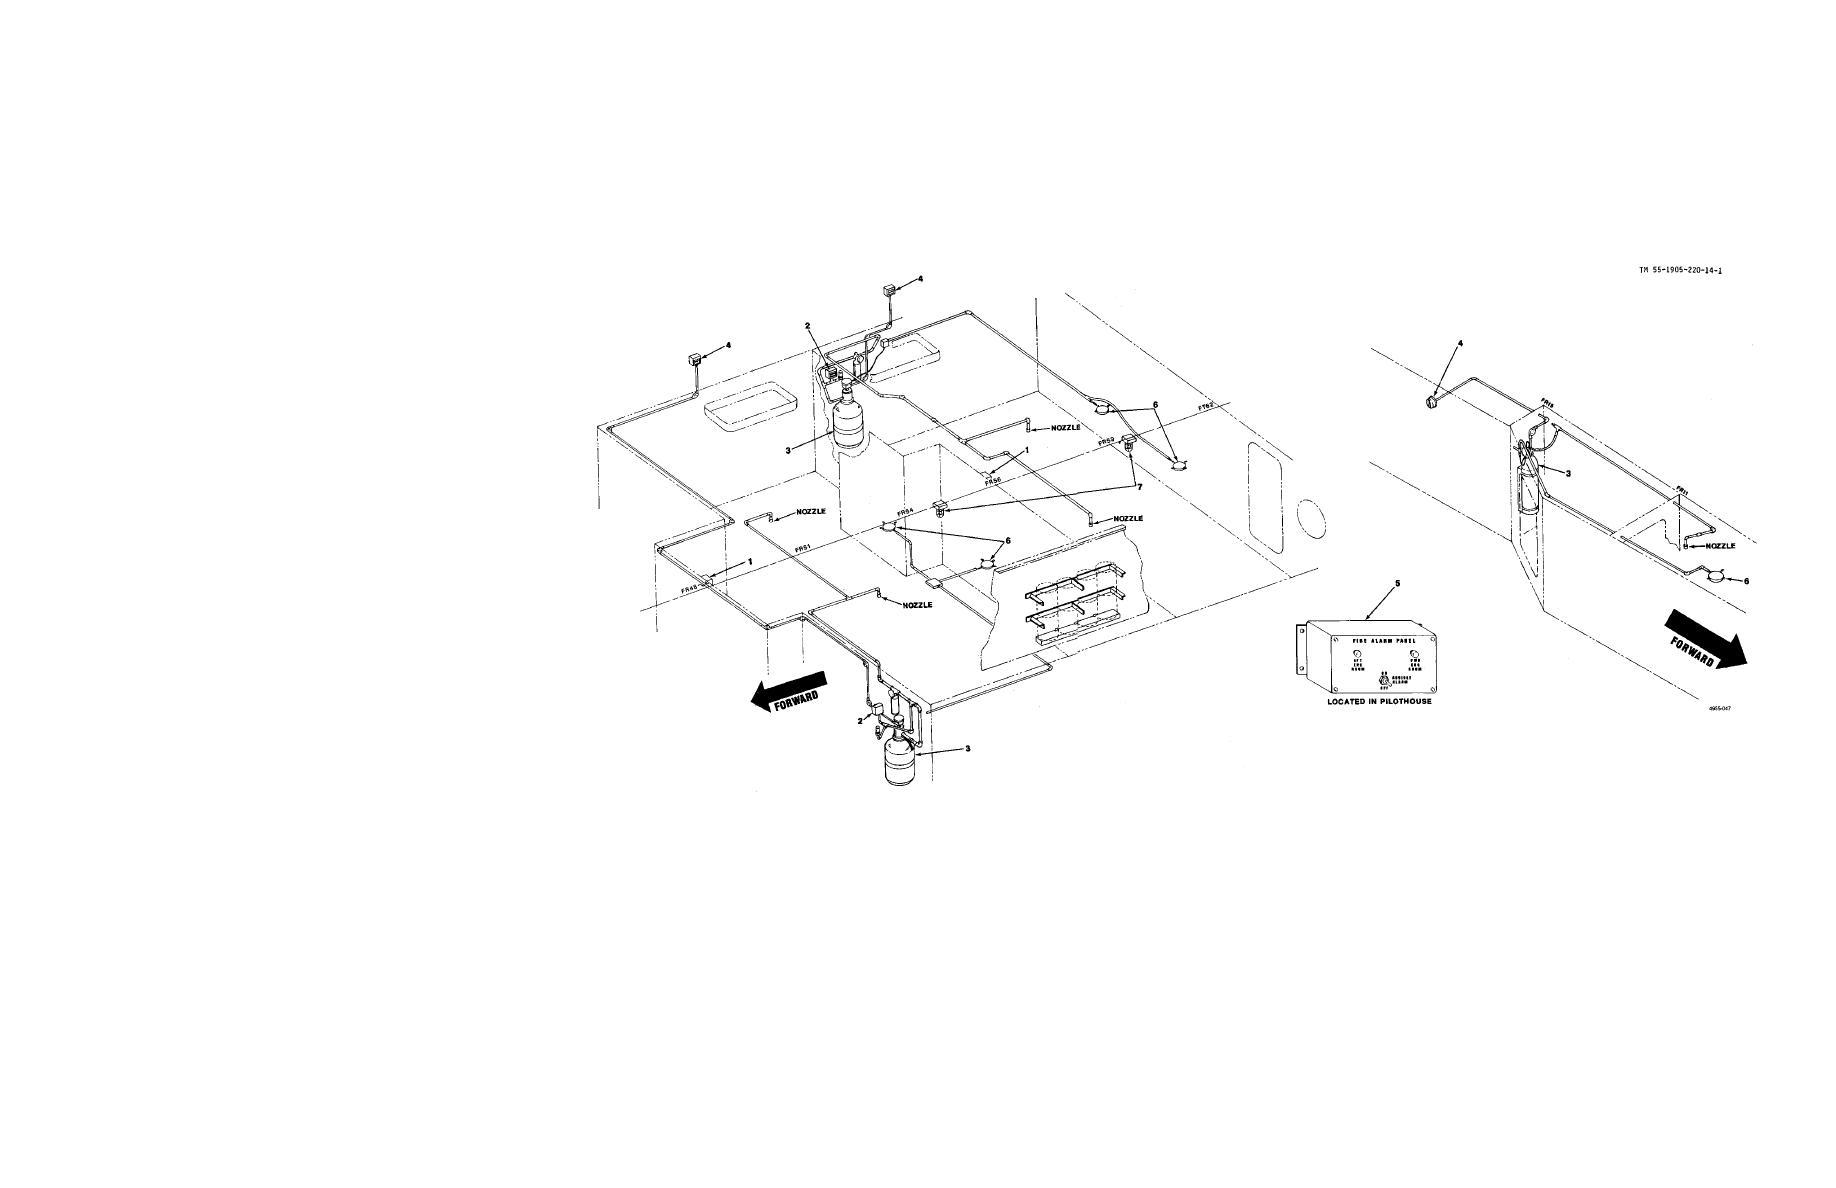 Figure FO-15. HALON SYSTEM